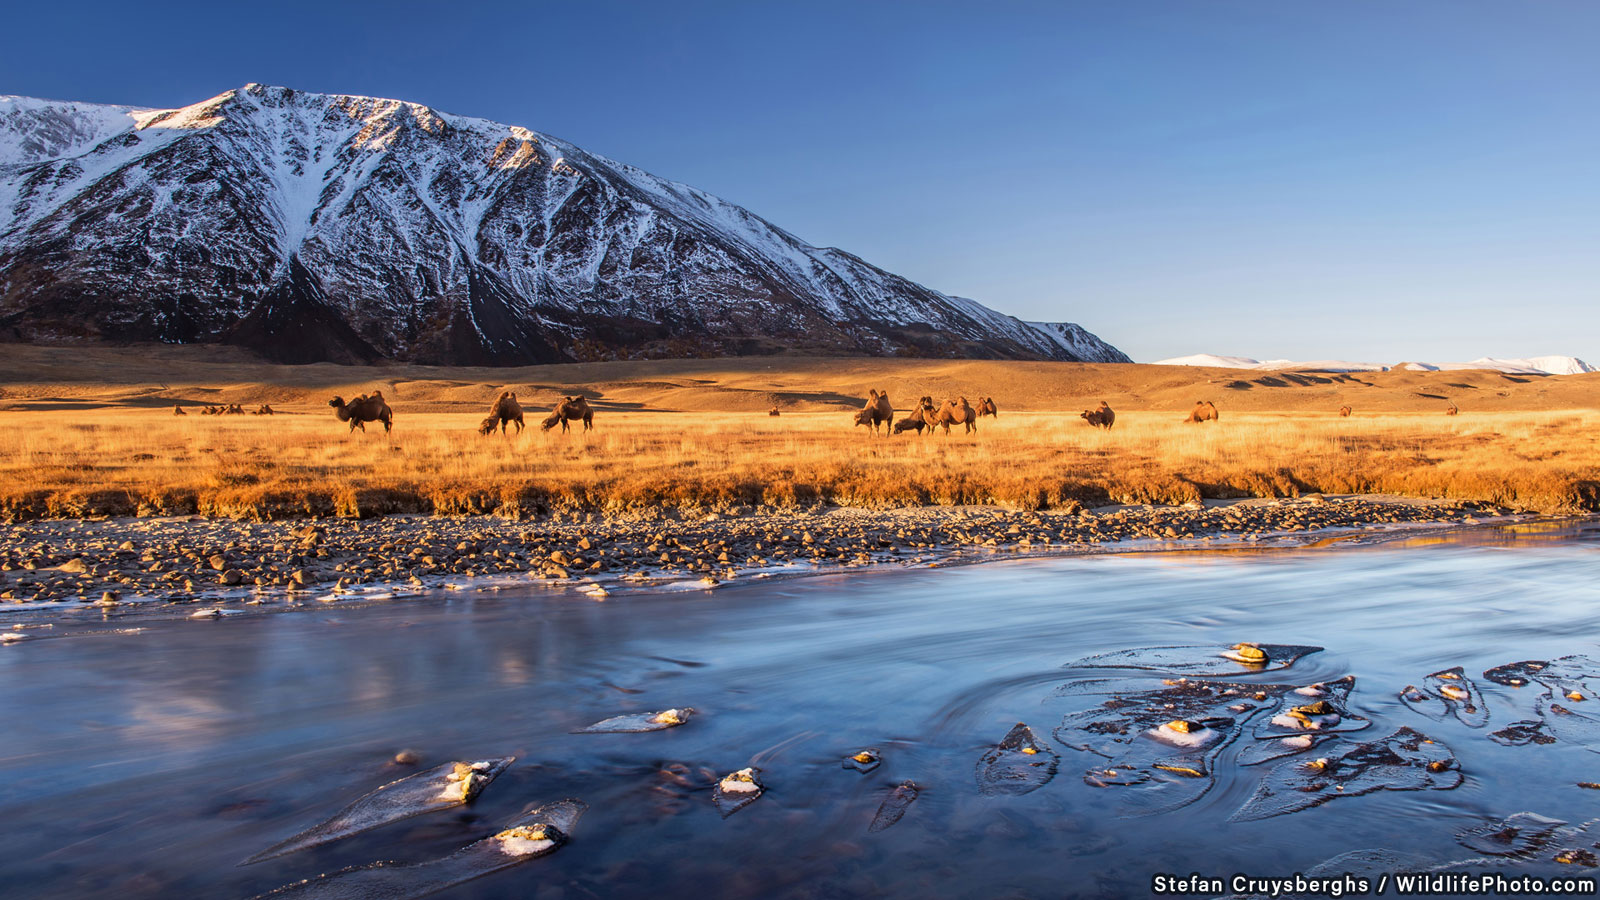 Sunrise in Altai, © Stefan Cruysberghs, Runner-Up, Habitats & Landscapes Photo Contest